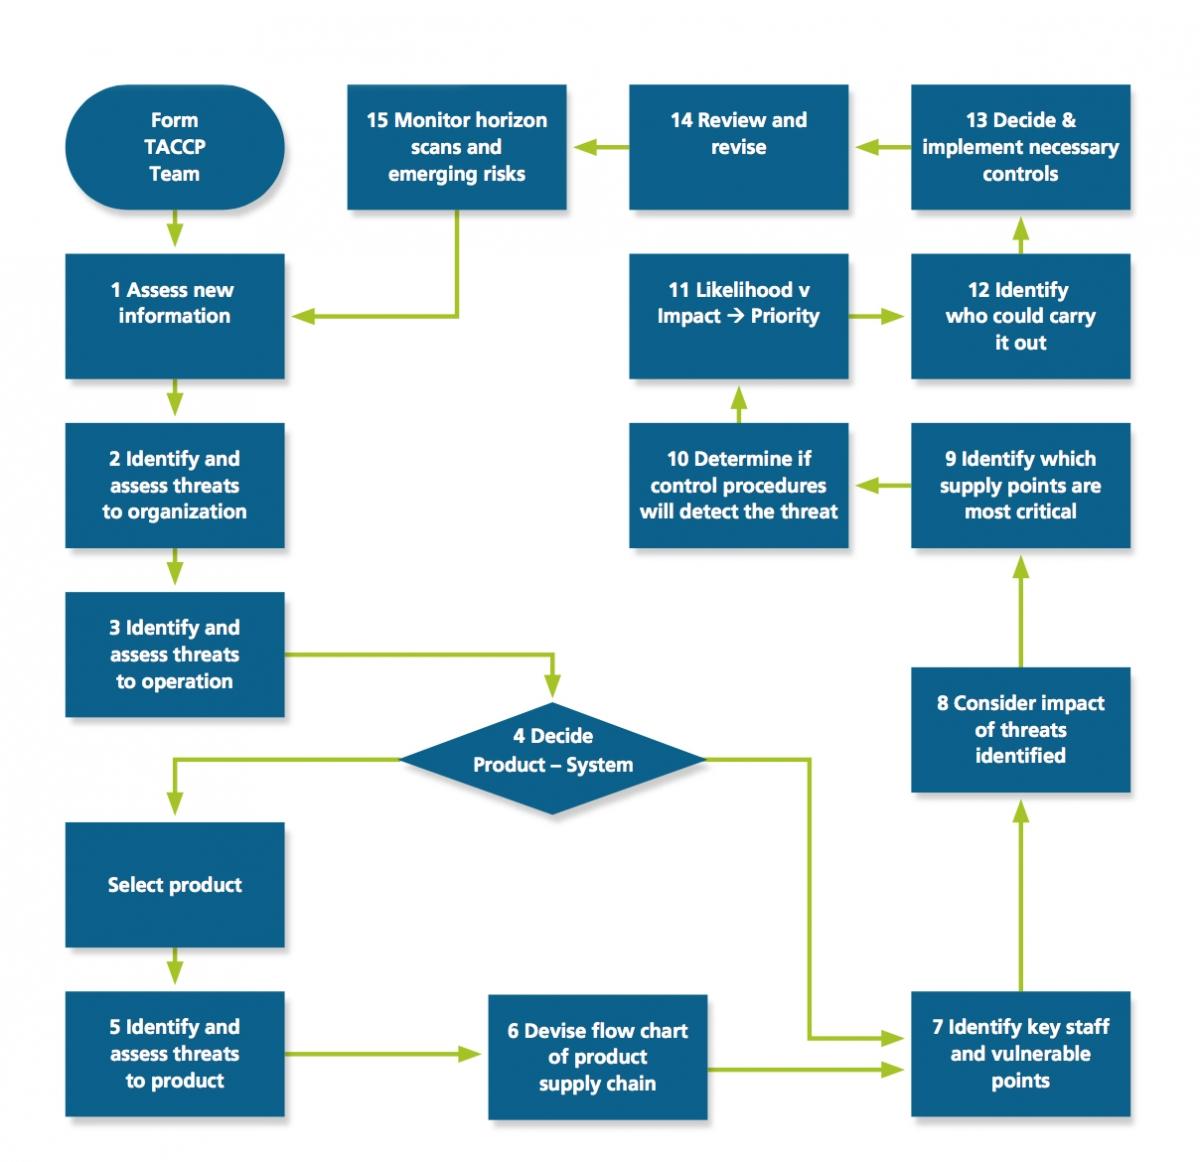 taccp process